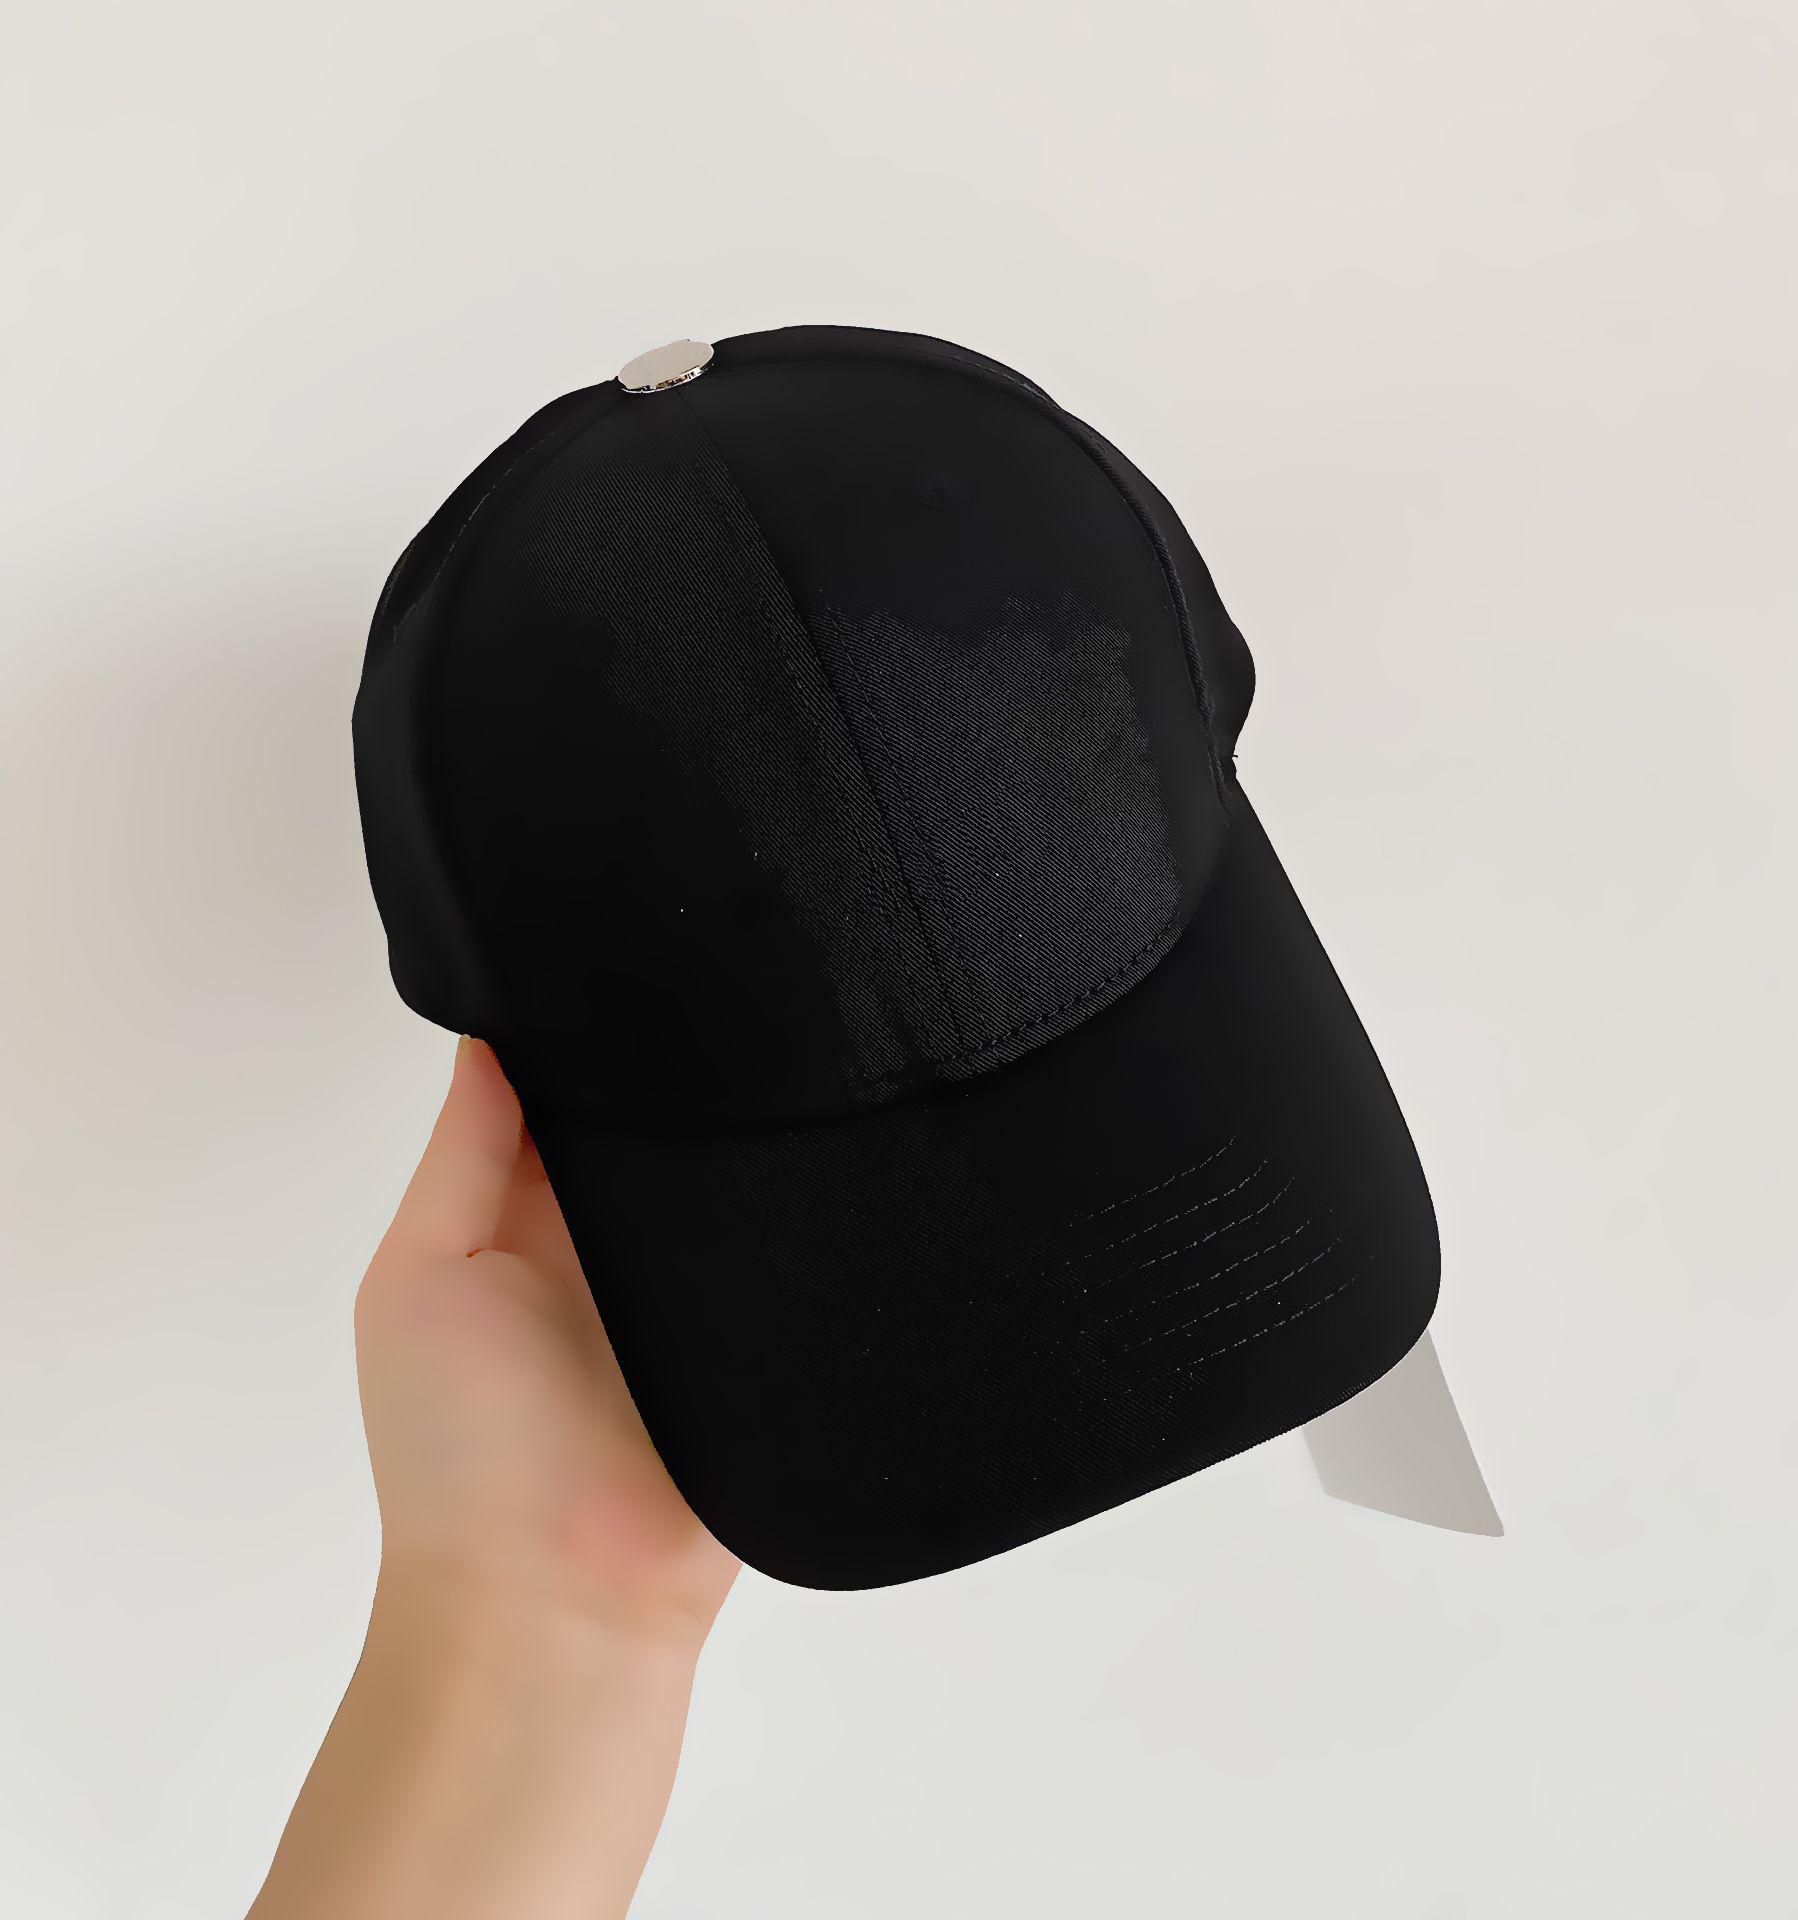 Clas Bucket Hat Beanies Ball Caps Bucket Hats hat bonnet Fitted hats for Men Woman Baseball Caps Beanie fisherman buckets hats patchwork summer Sunhat fit Visor Solid